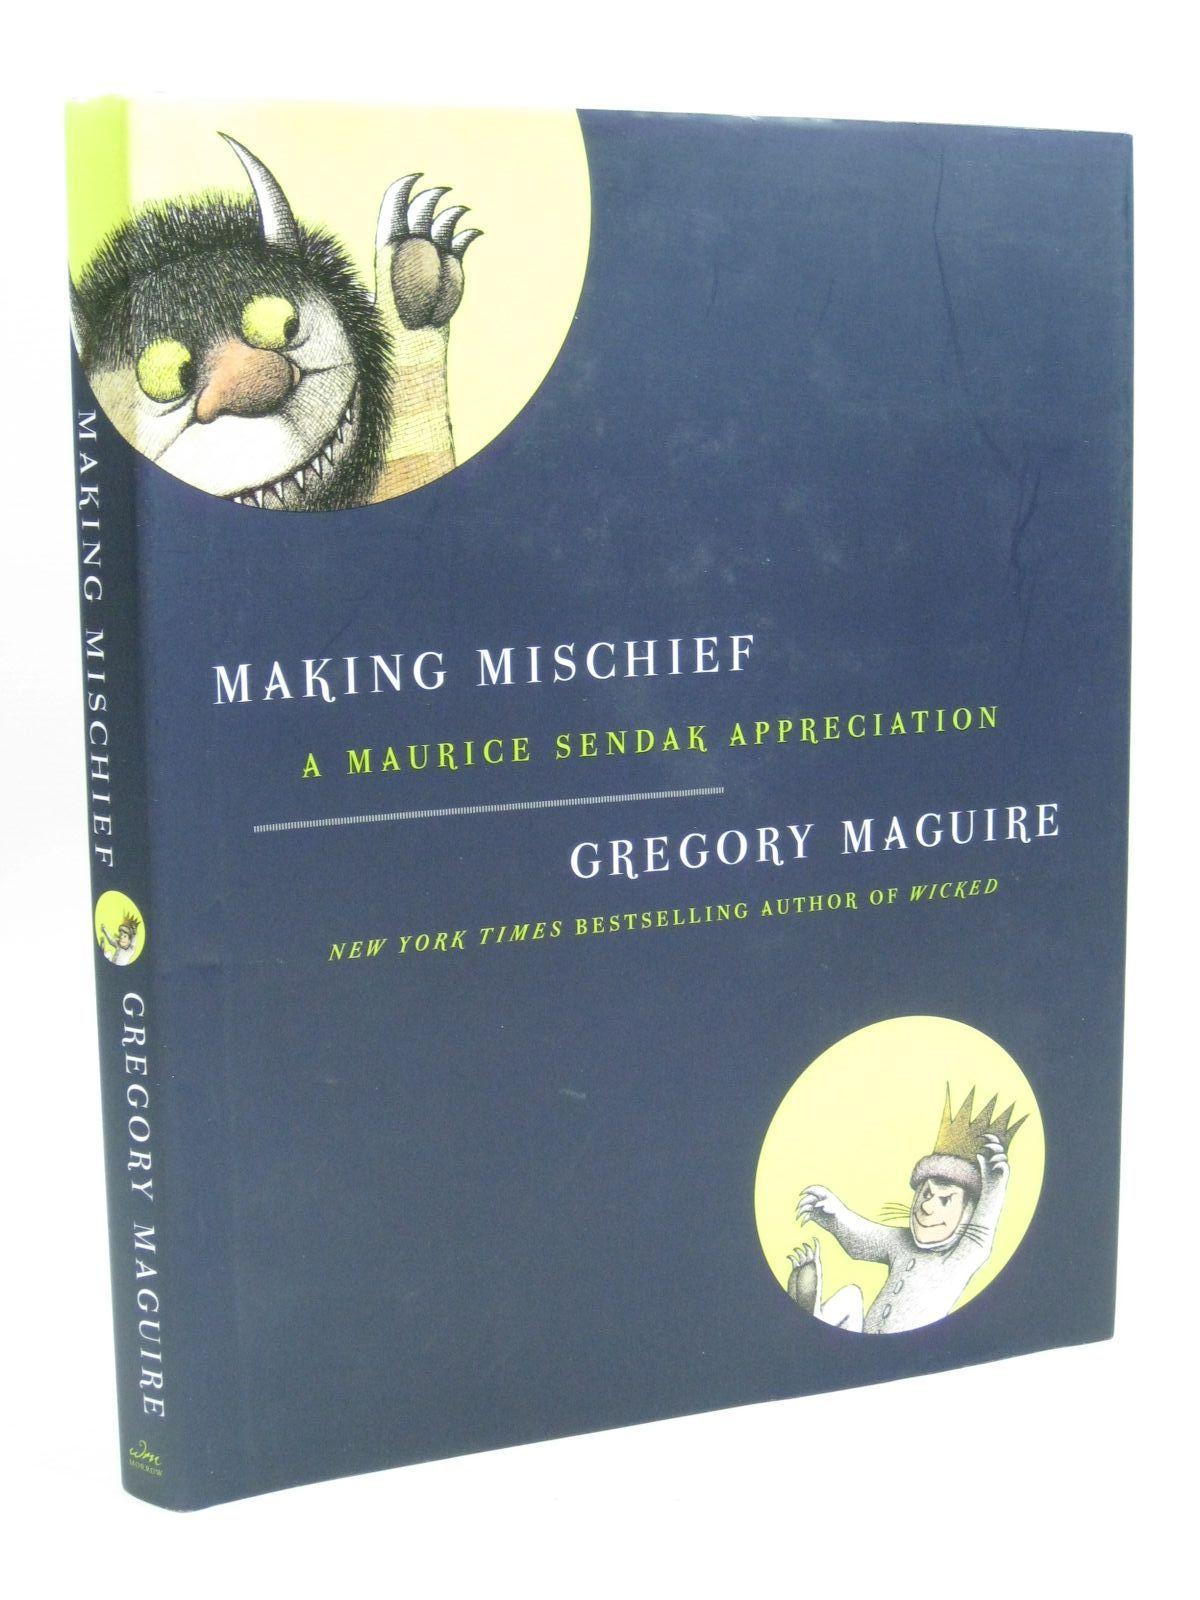 Photo of MAKING MISCHIEF A MAURICE SENDAK APPRECIATION